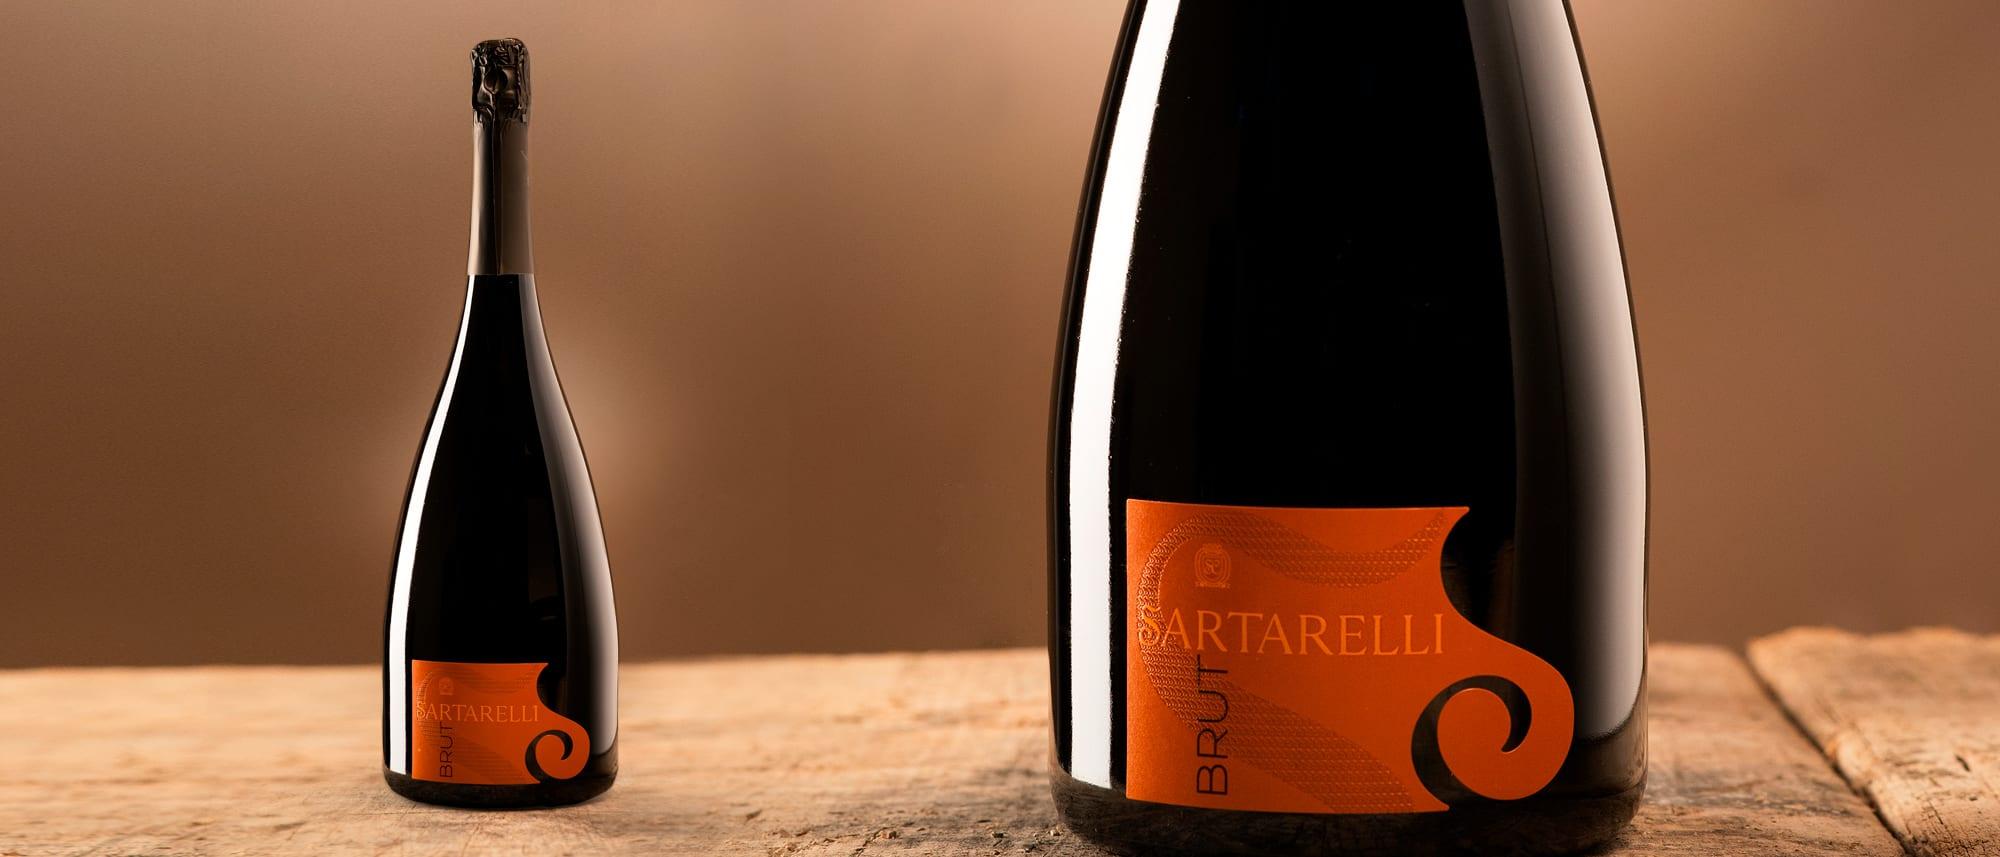 Bottiglia Sartarelli Brut